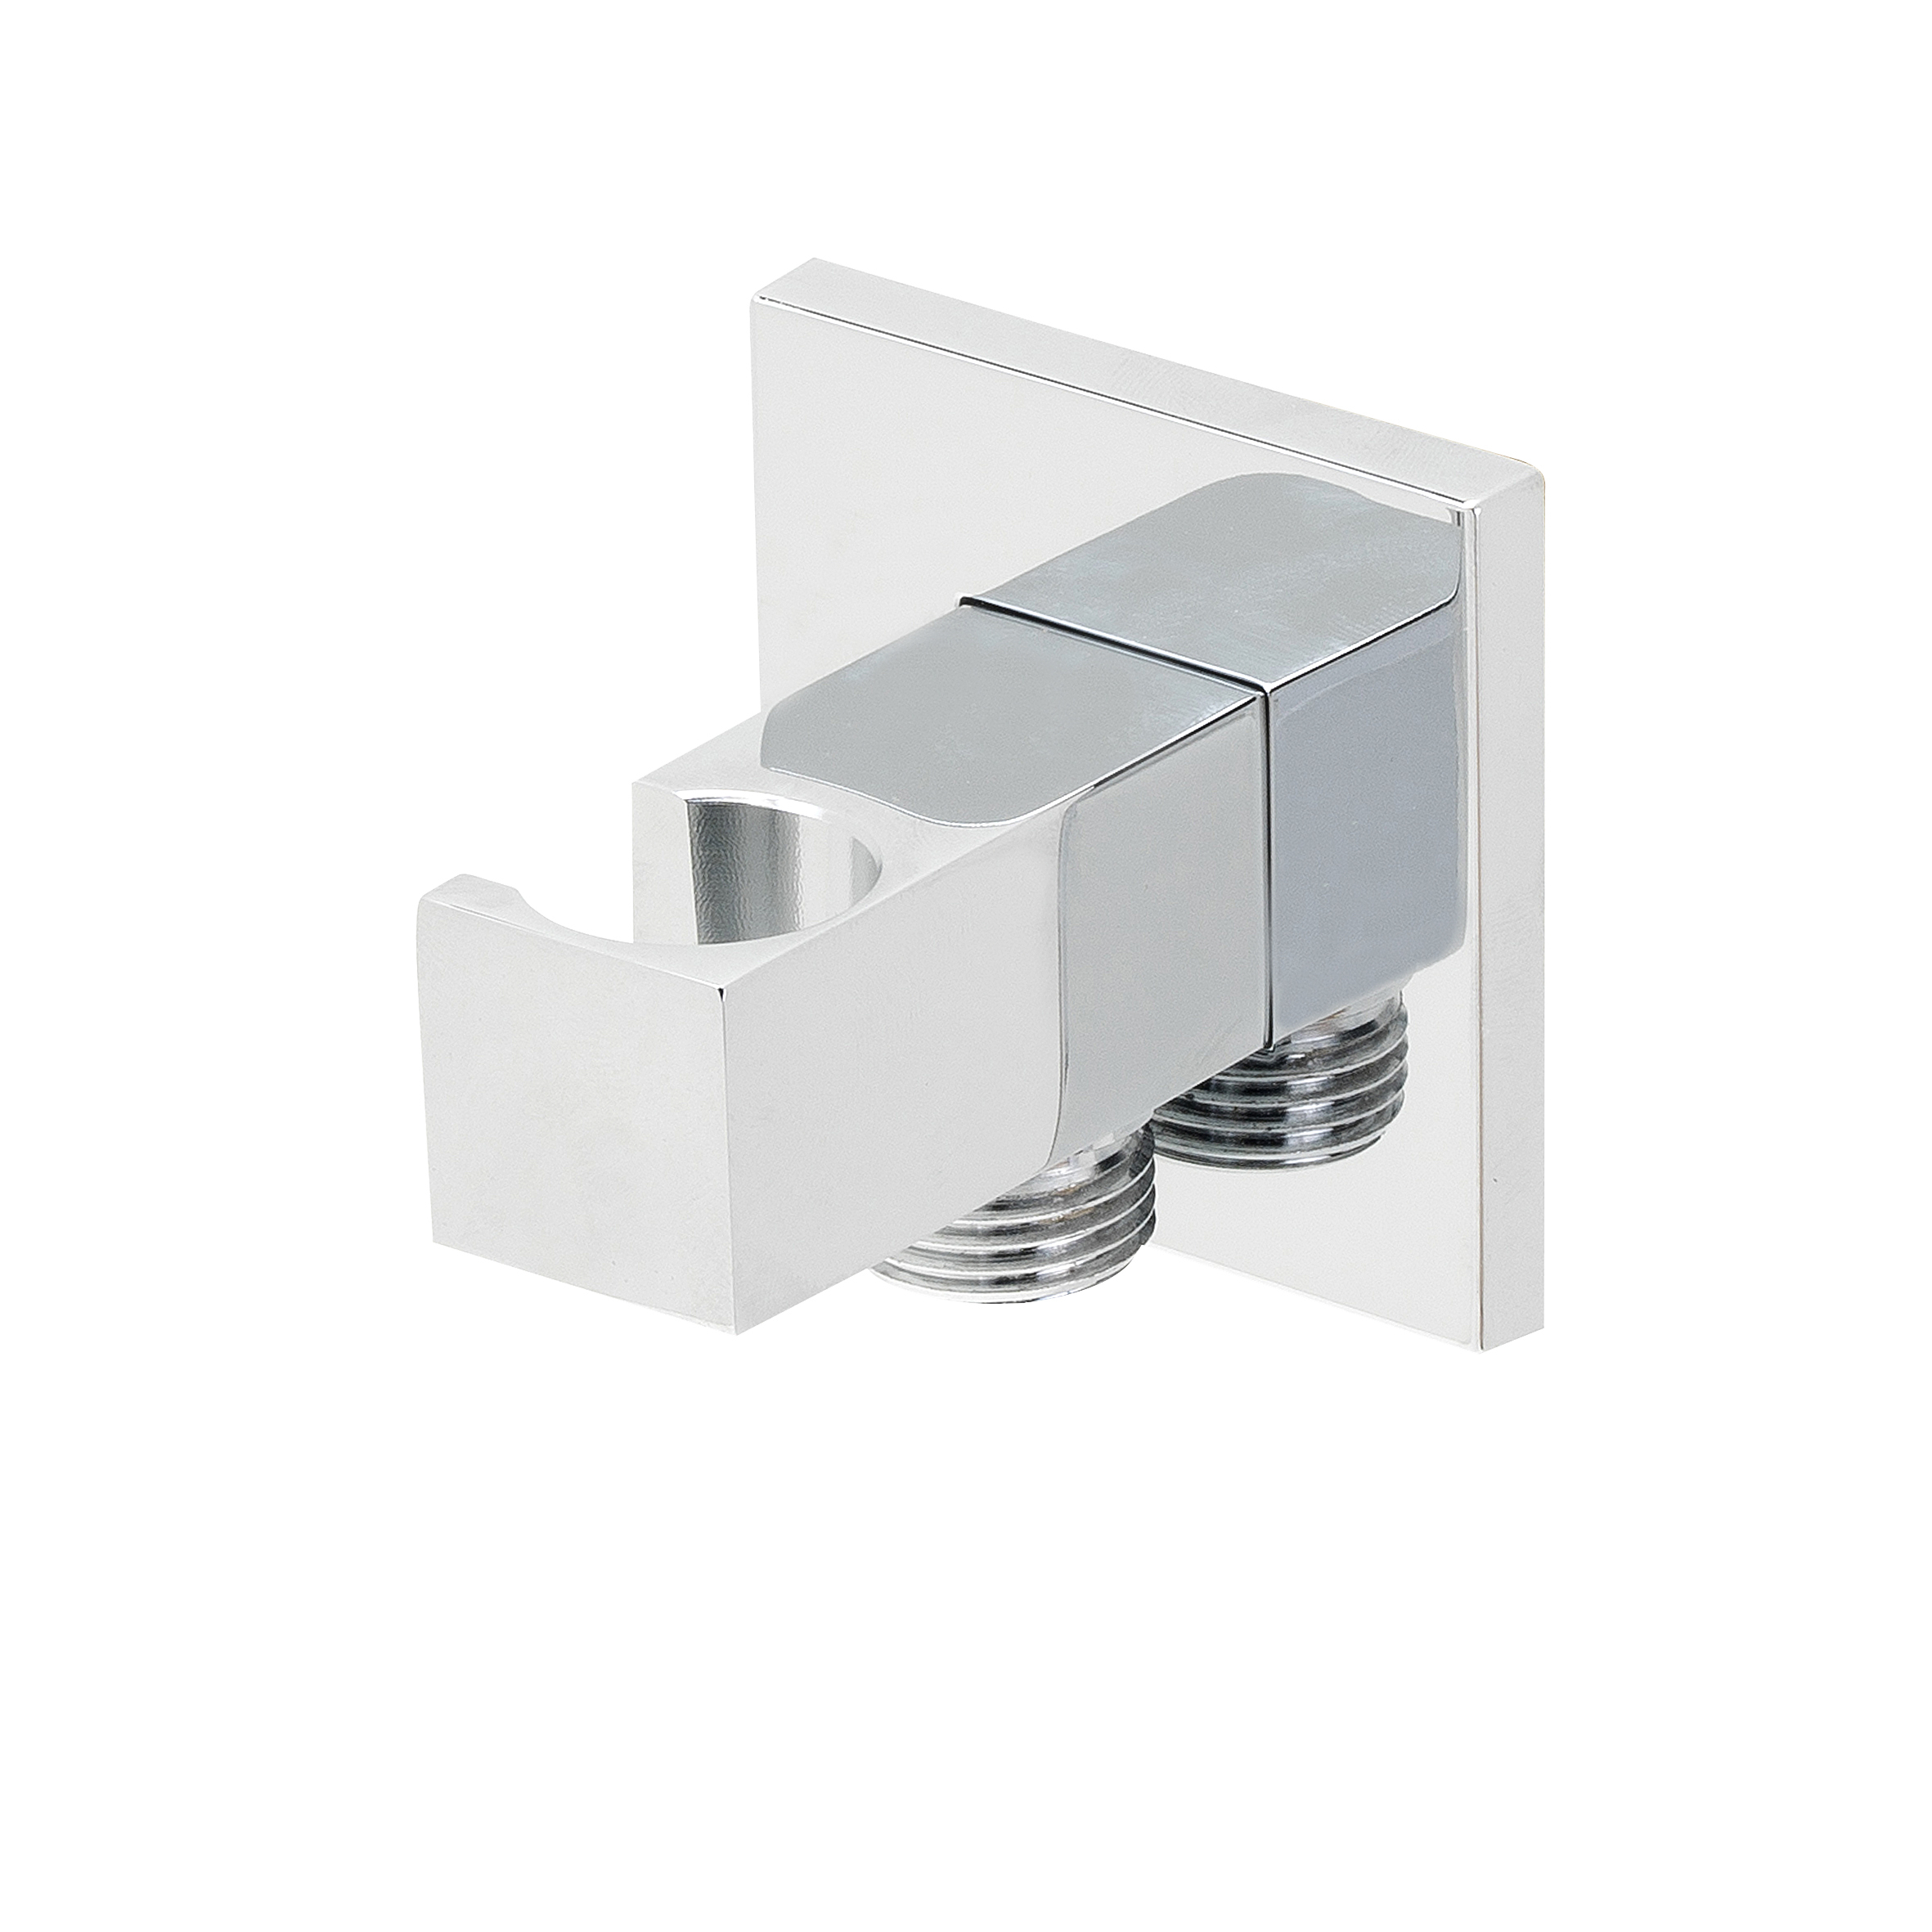 Mueller Cube Luxe muur doucheaansluiting+opsteek vierk.1/2 chr.